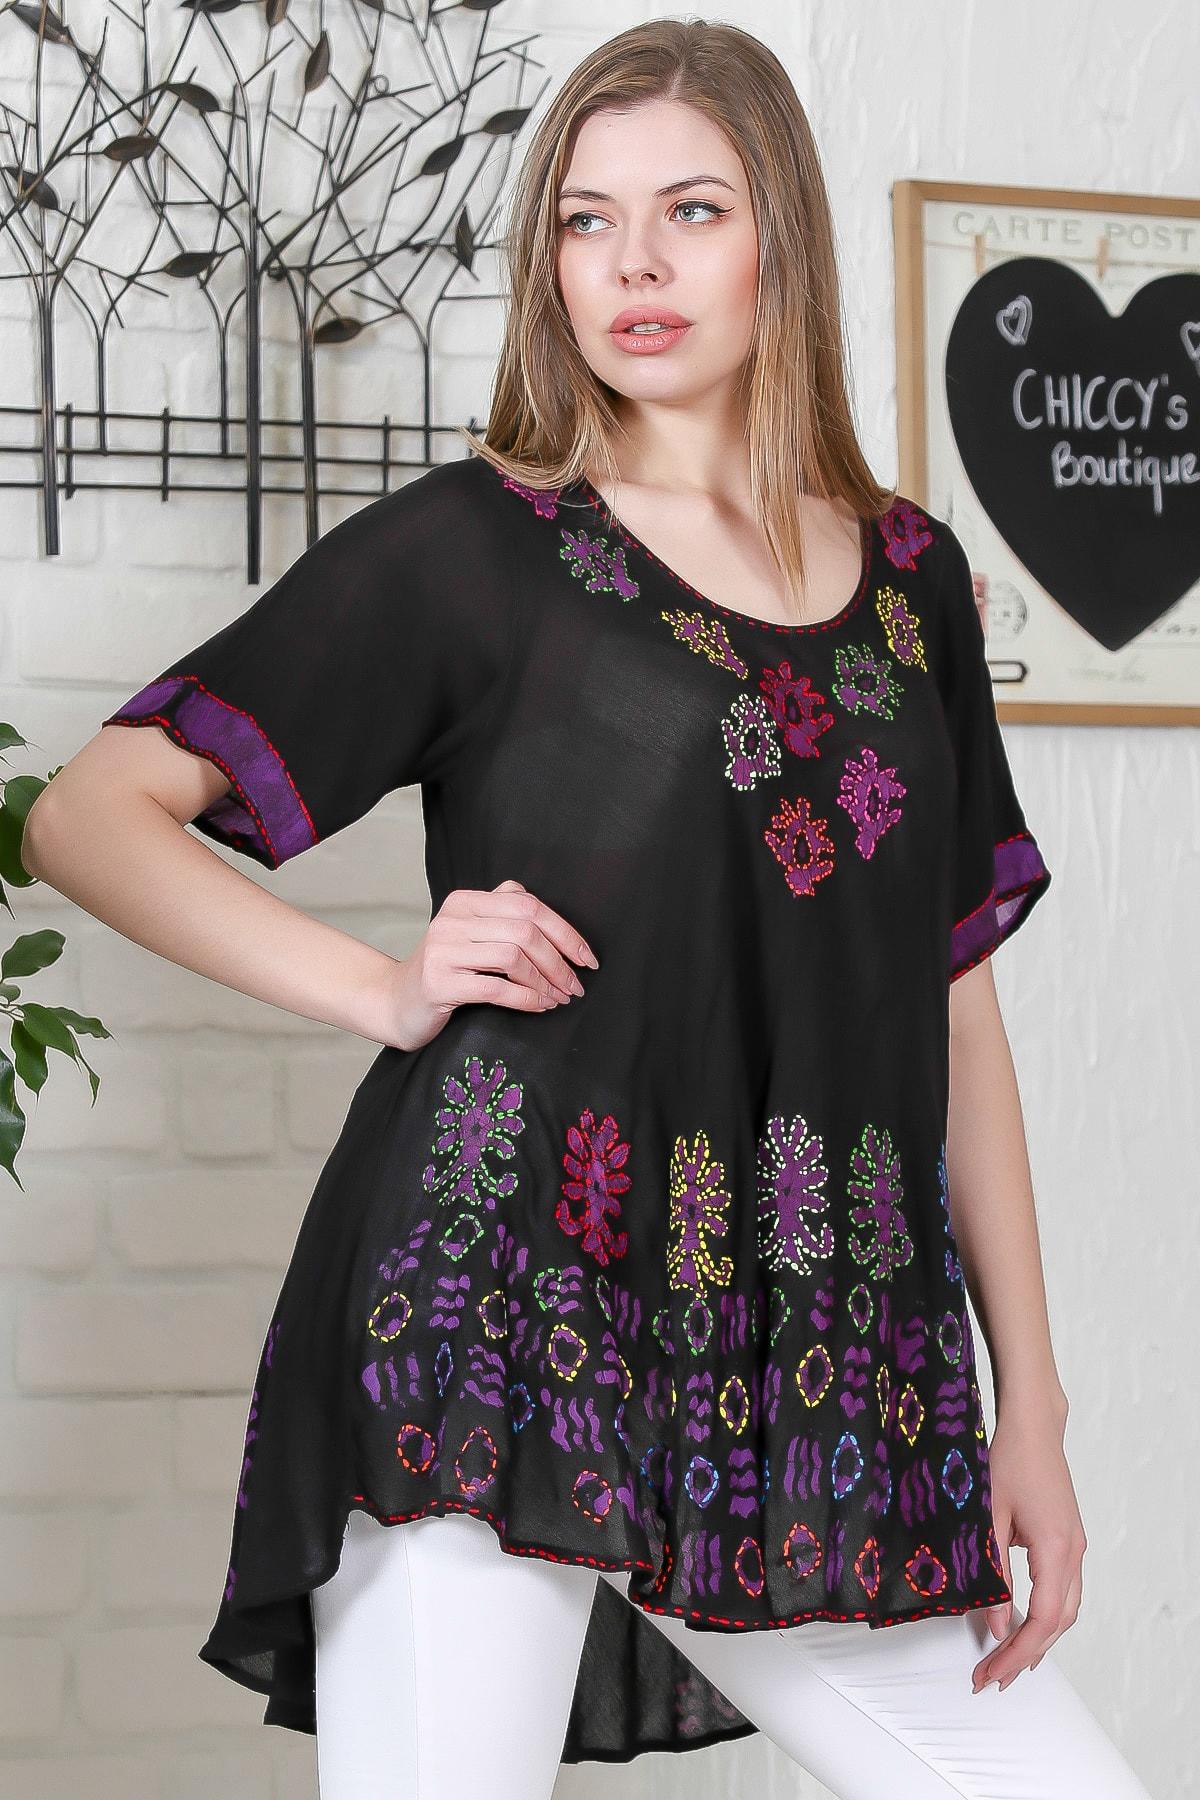 Chiccy Kadın Siyah Çiçek Baskılı Nakış Dikişli Kısa Kol Batik Salaş Dokuma Bluz M10010200BL95495 1